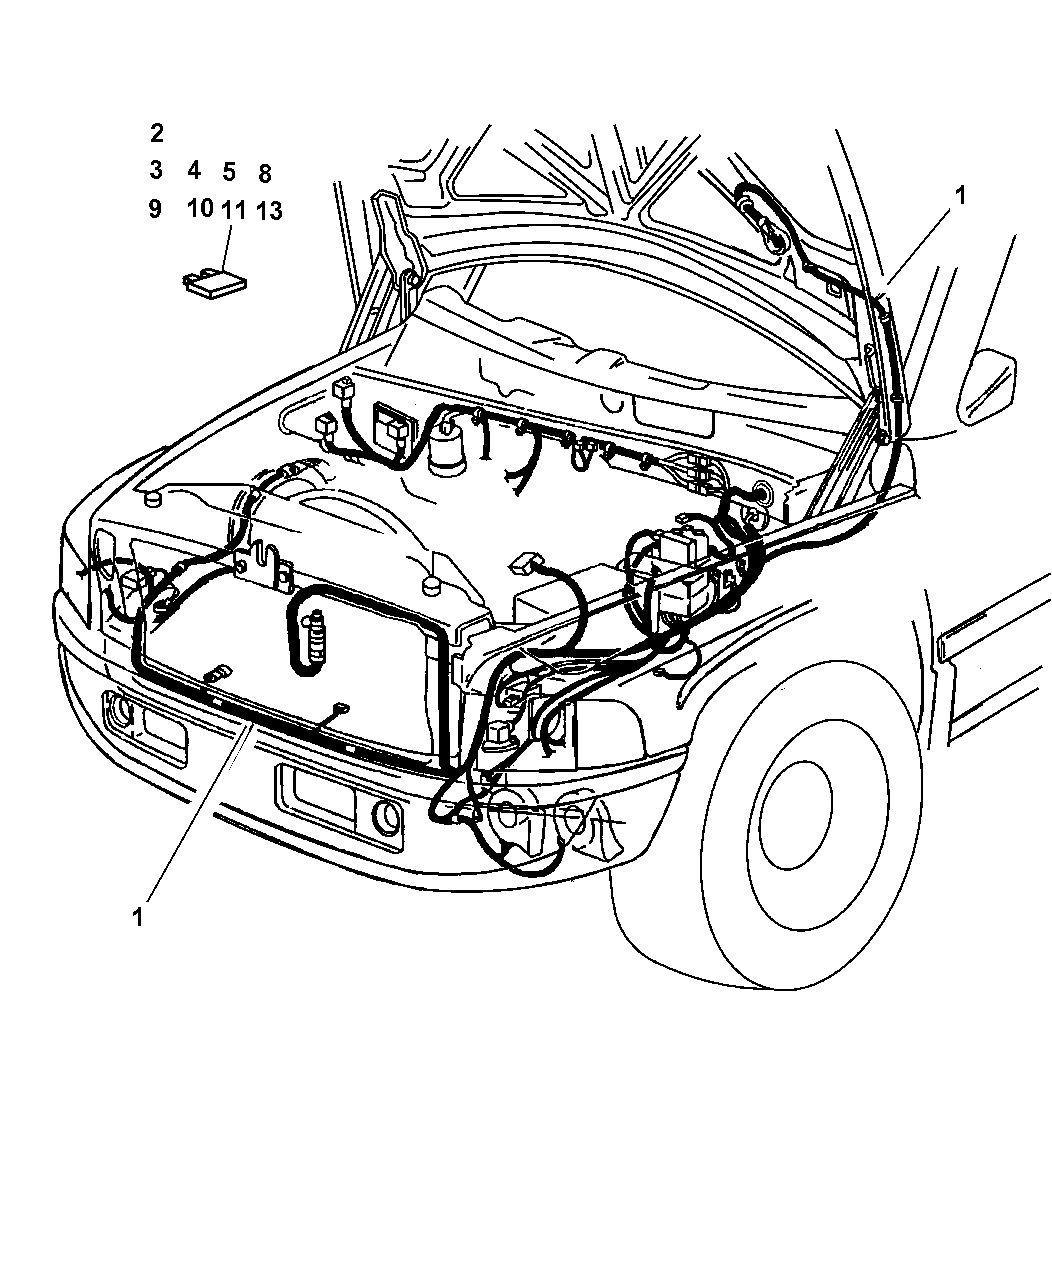 56045944ae Genuine Dodge Wiring Headlamp To Dash 2001 Ram 3500 Headlight Quad Club Cab